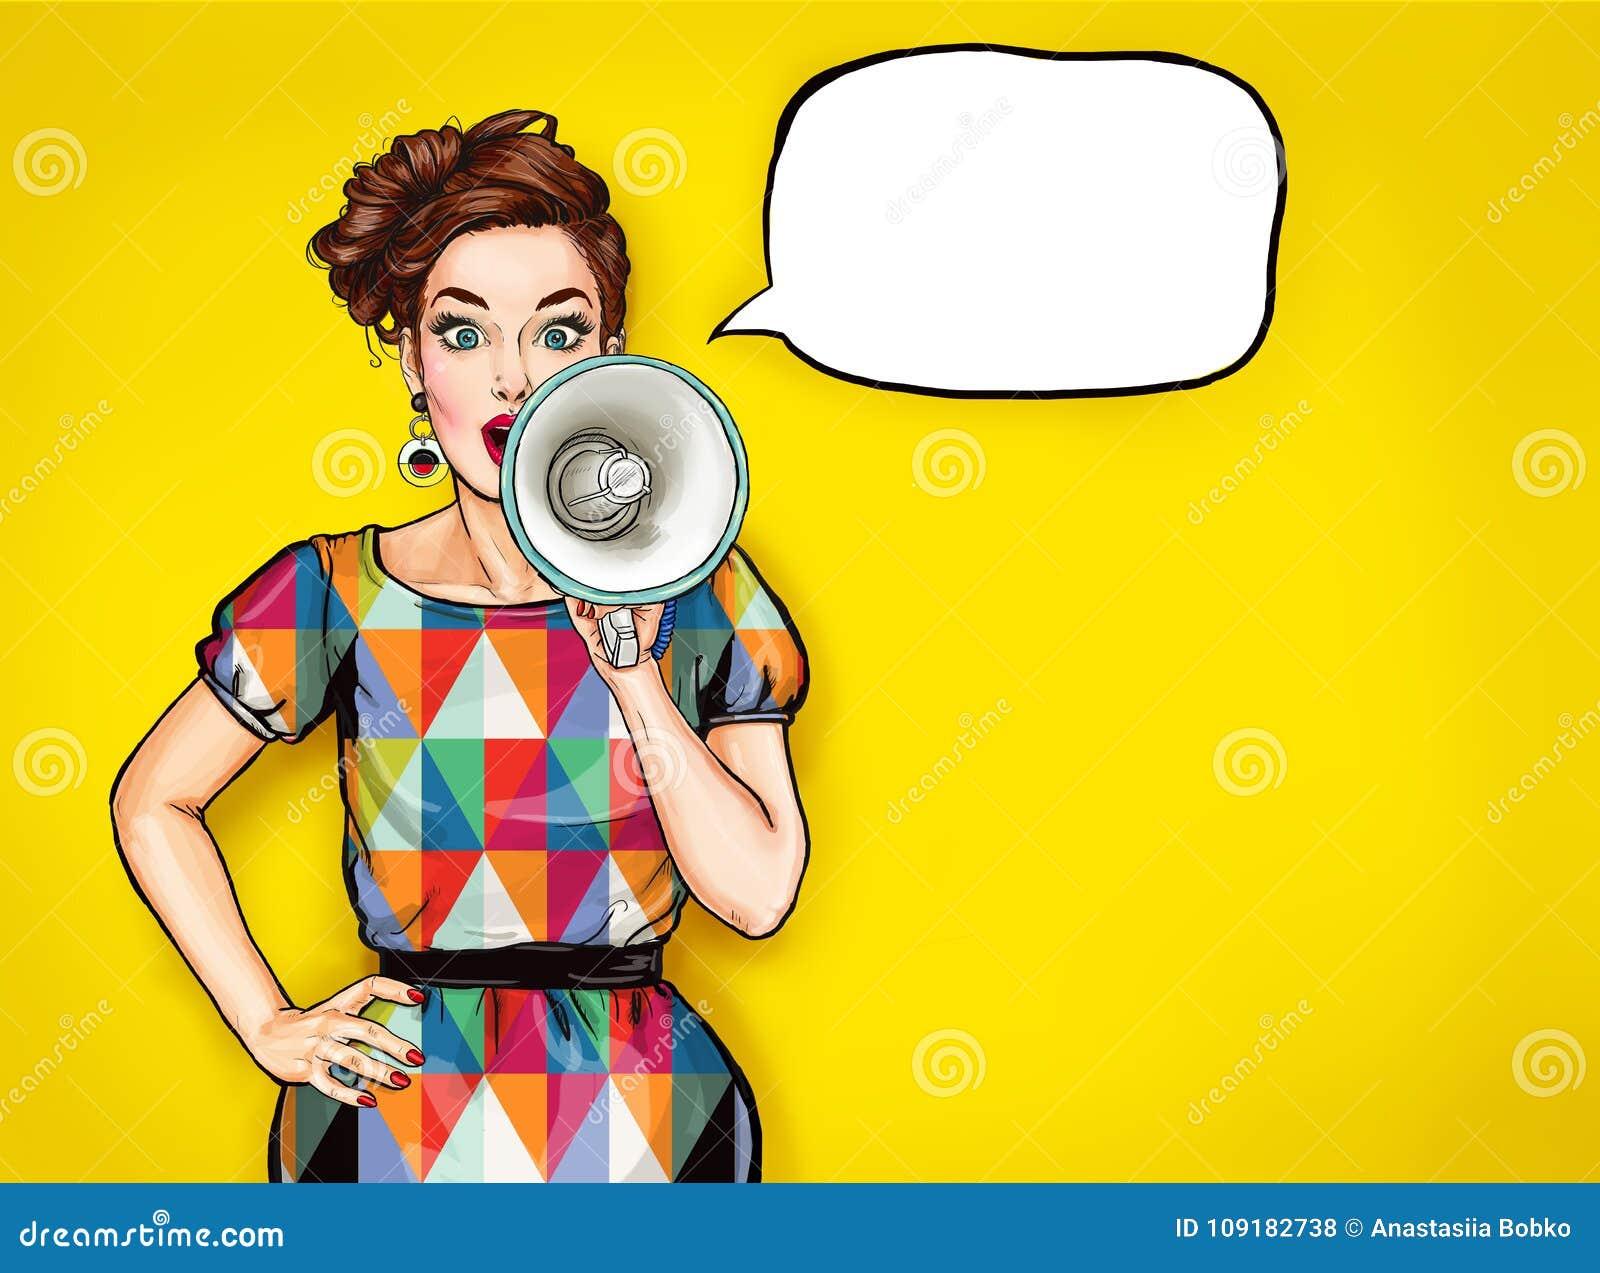 Pop art girl with megaphone. Woman with loudspeaker.